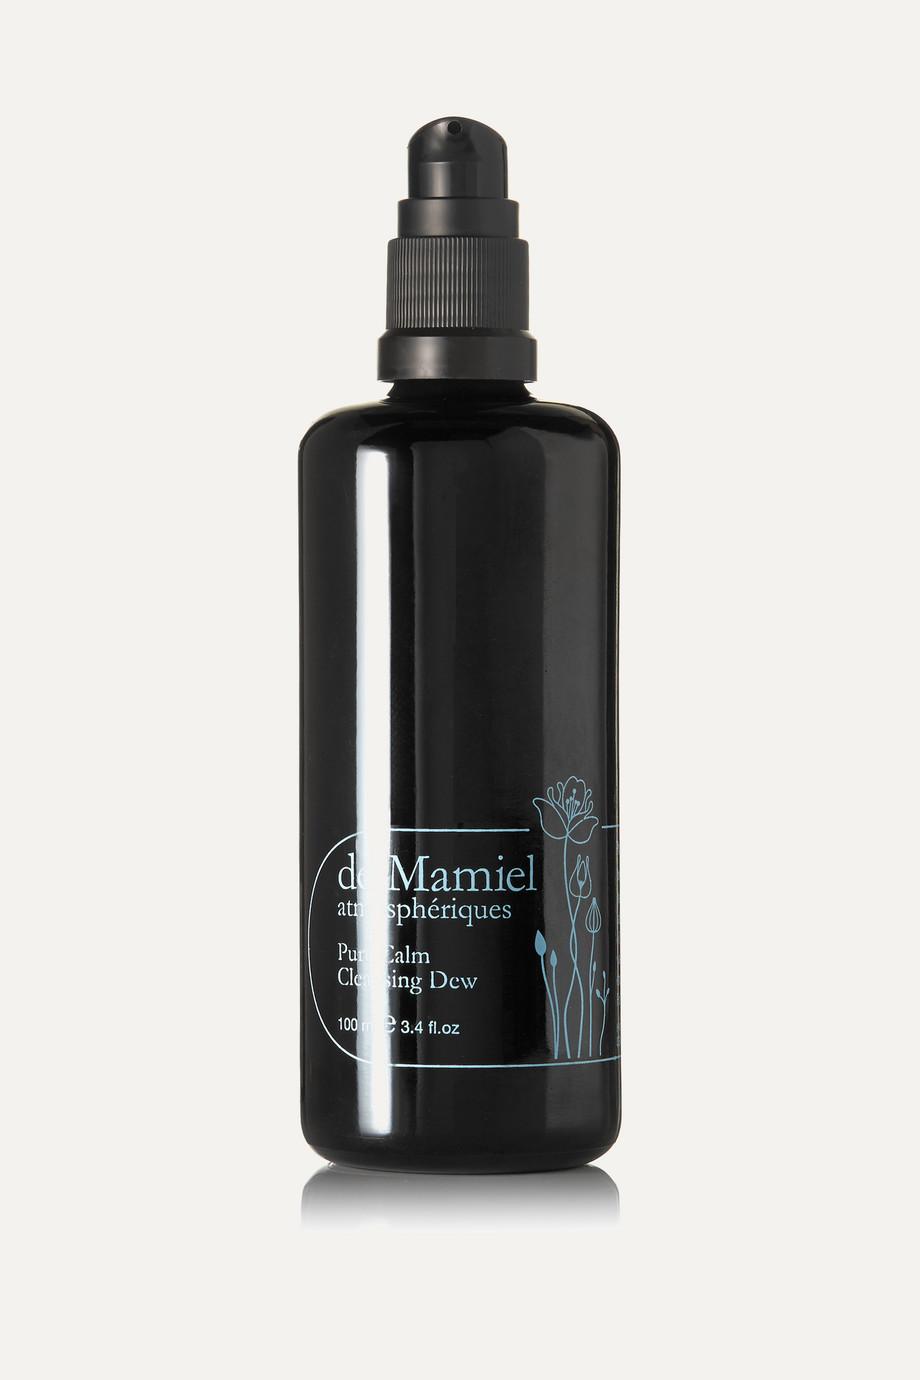 de Mamiel Pure Calm Cleansing Dew, 100ml